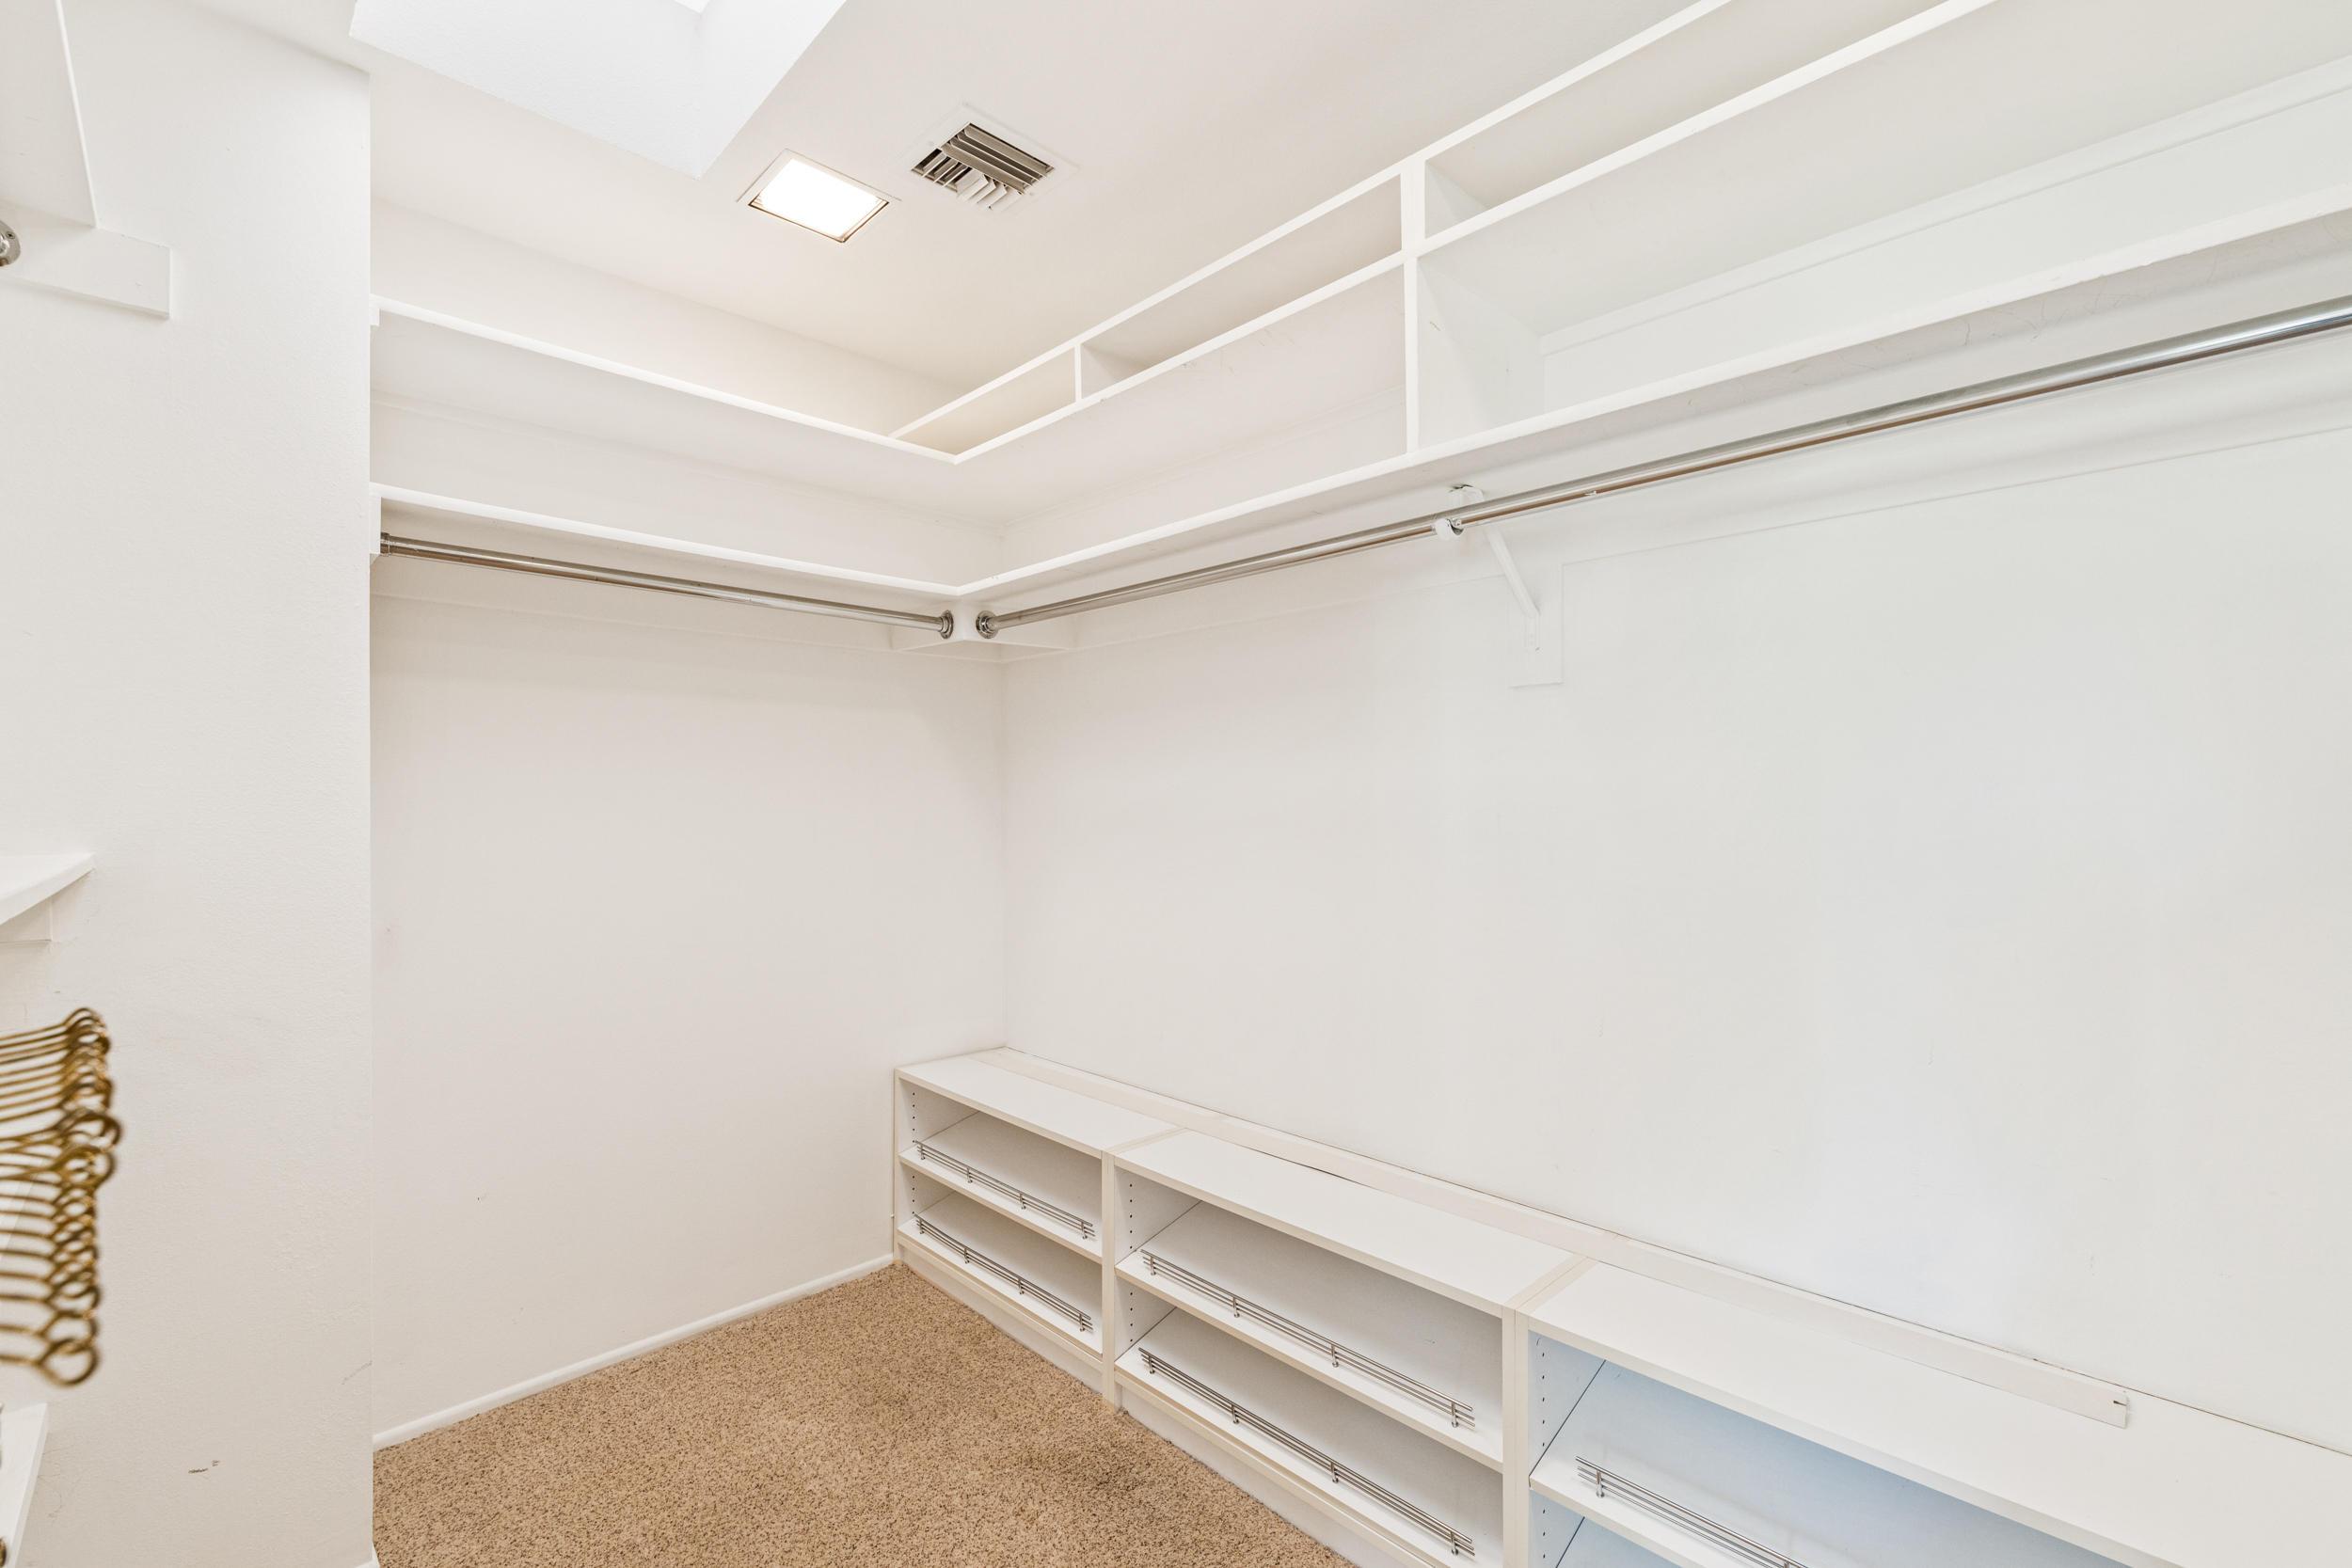 2 Surrey Court, Rancho Mirage, California 92270, 3 Bedrooms Bedrooms, ,3 BathroomsBathrooms,Residential,For Sale,2 Surrey Court,219036787